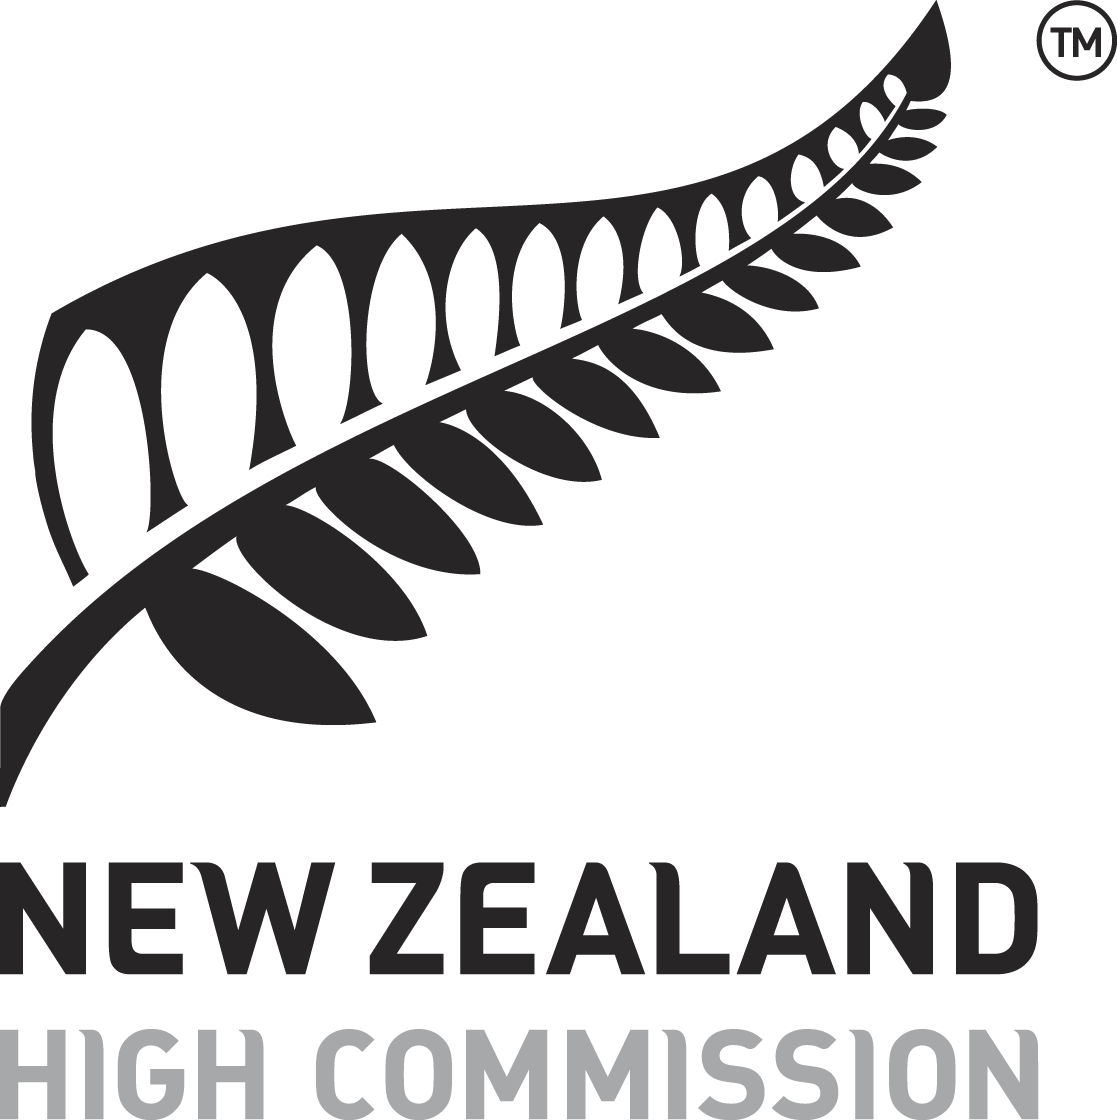 Logos new zealand ministry. Fern clipart fern nz